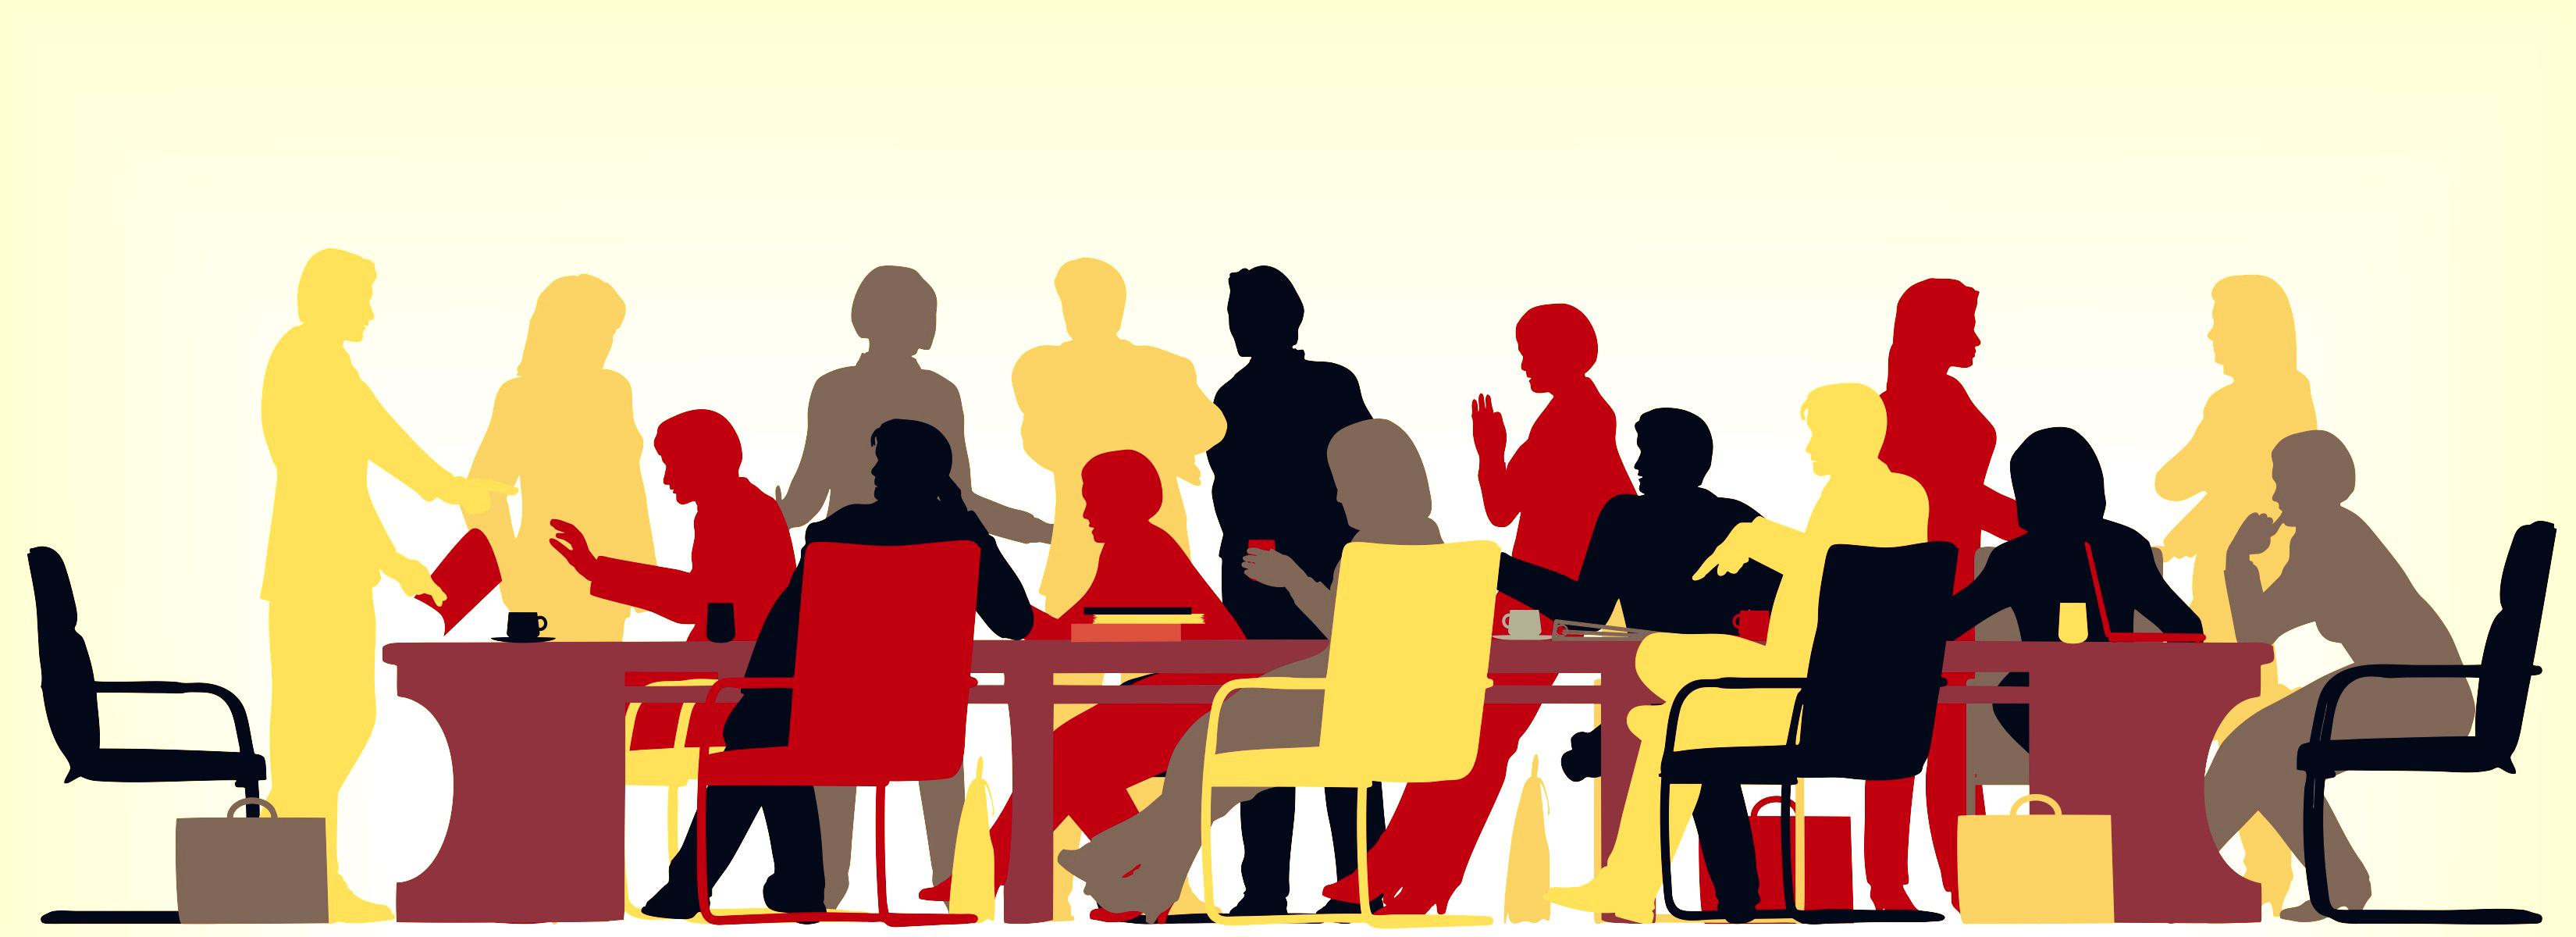 Planning clipart parish council. Clip art library